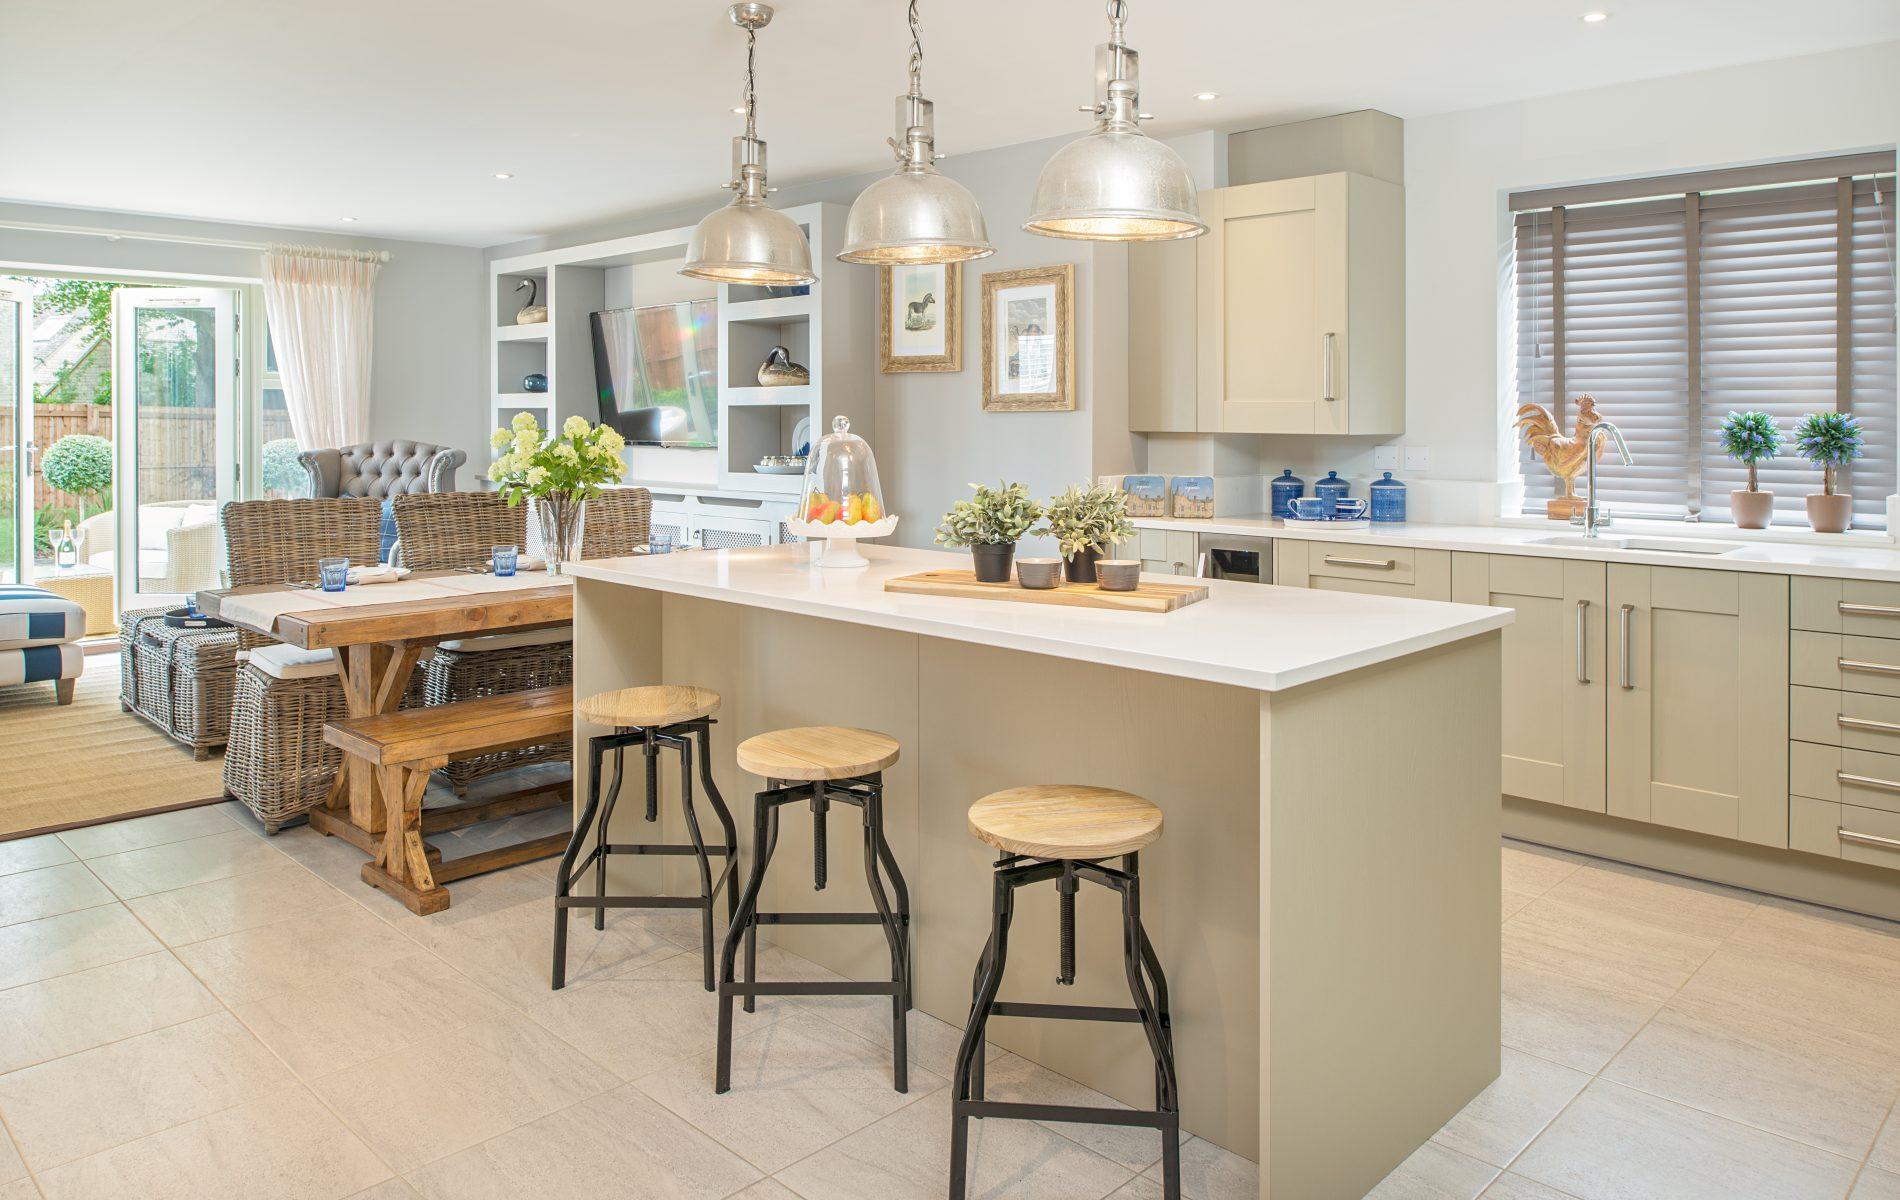 Plot 14, High Trees, Tetbury, Cala Homes Midlands